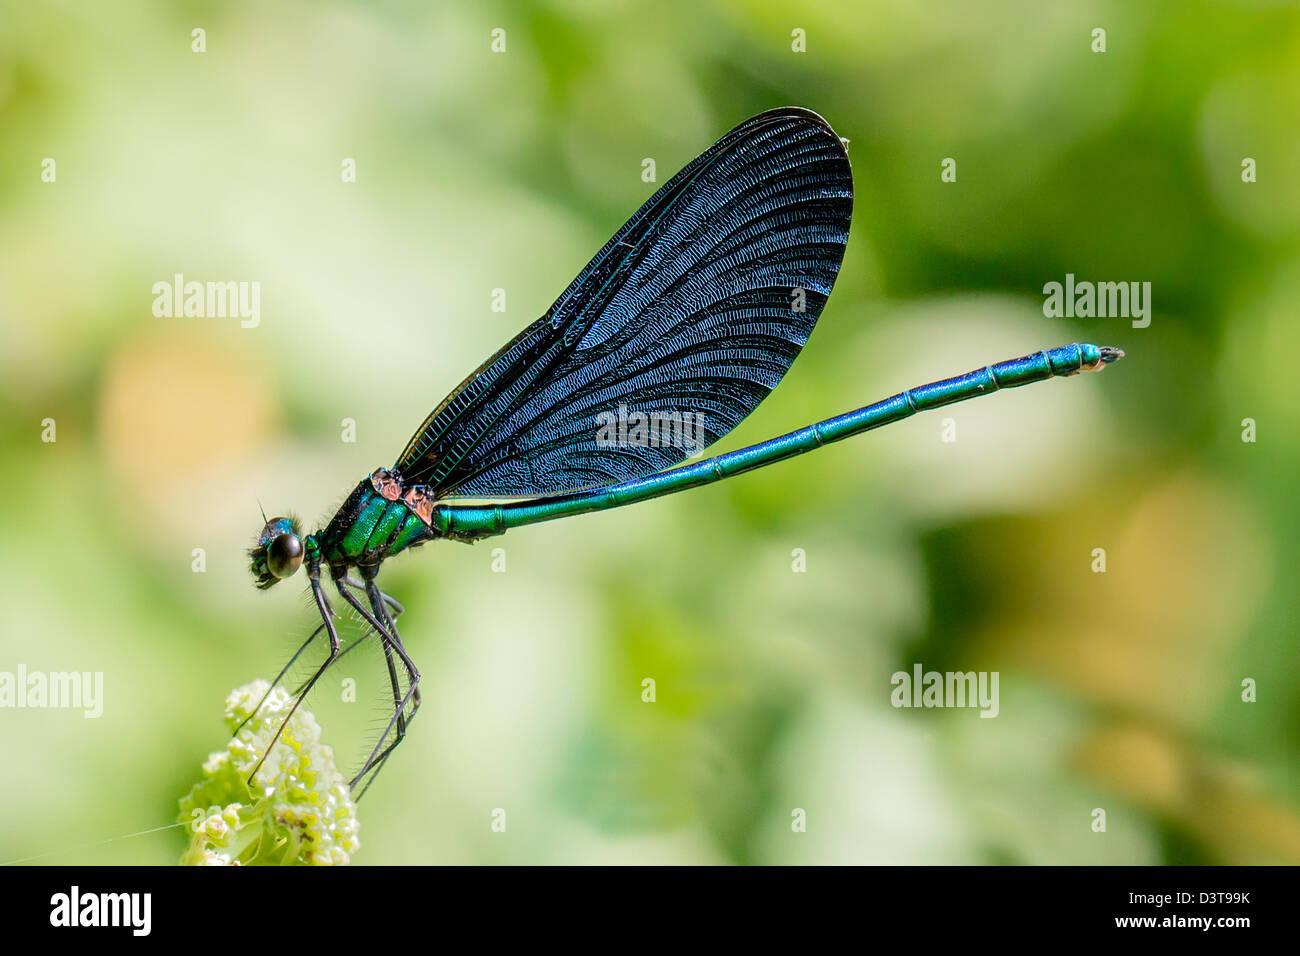 Dragonfly, Banded Demoiselle (Calopteryx splendens) Stock Photo